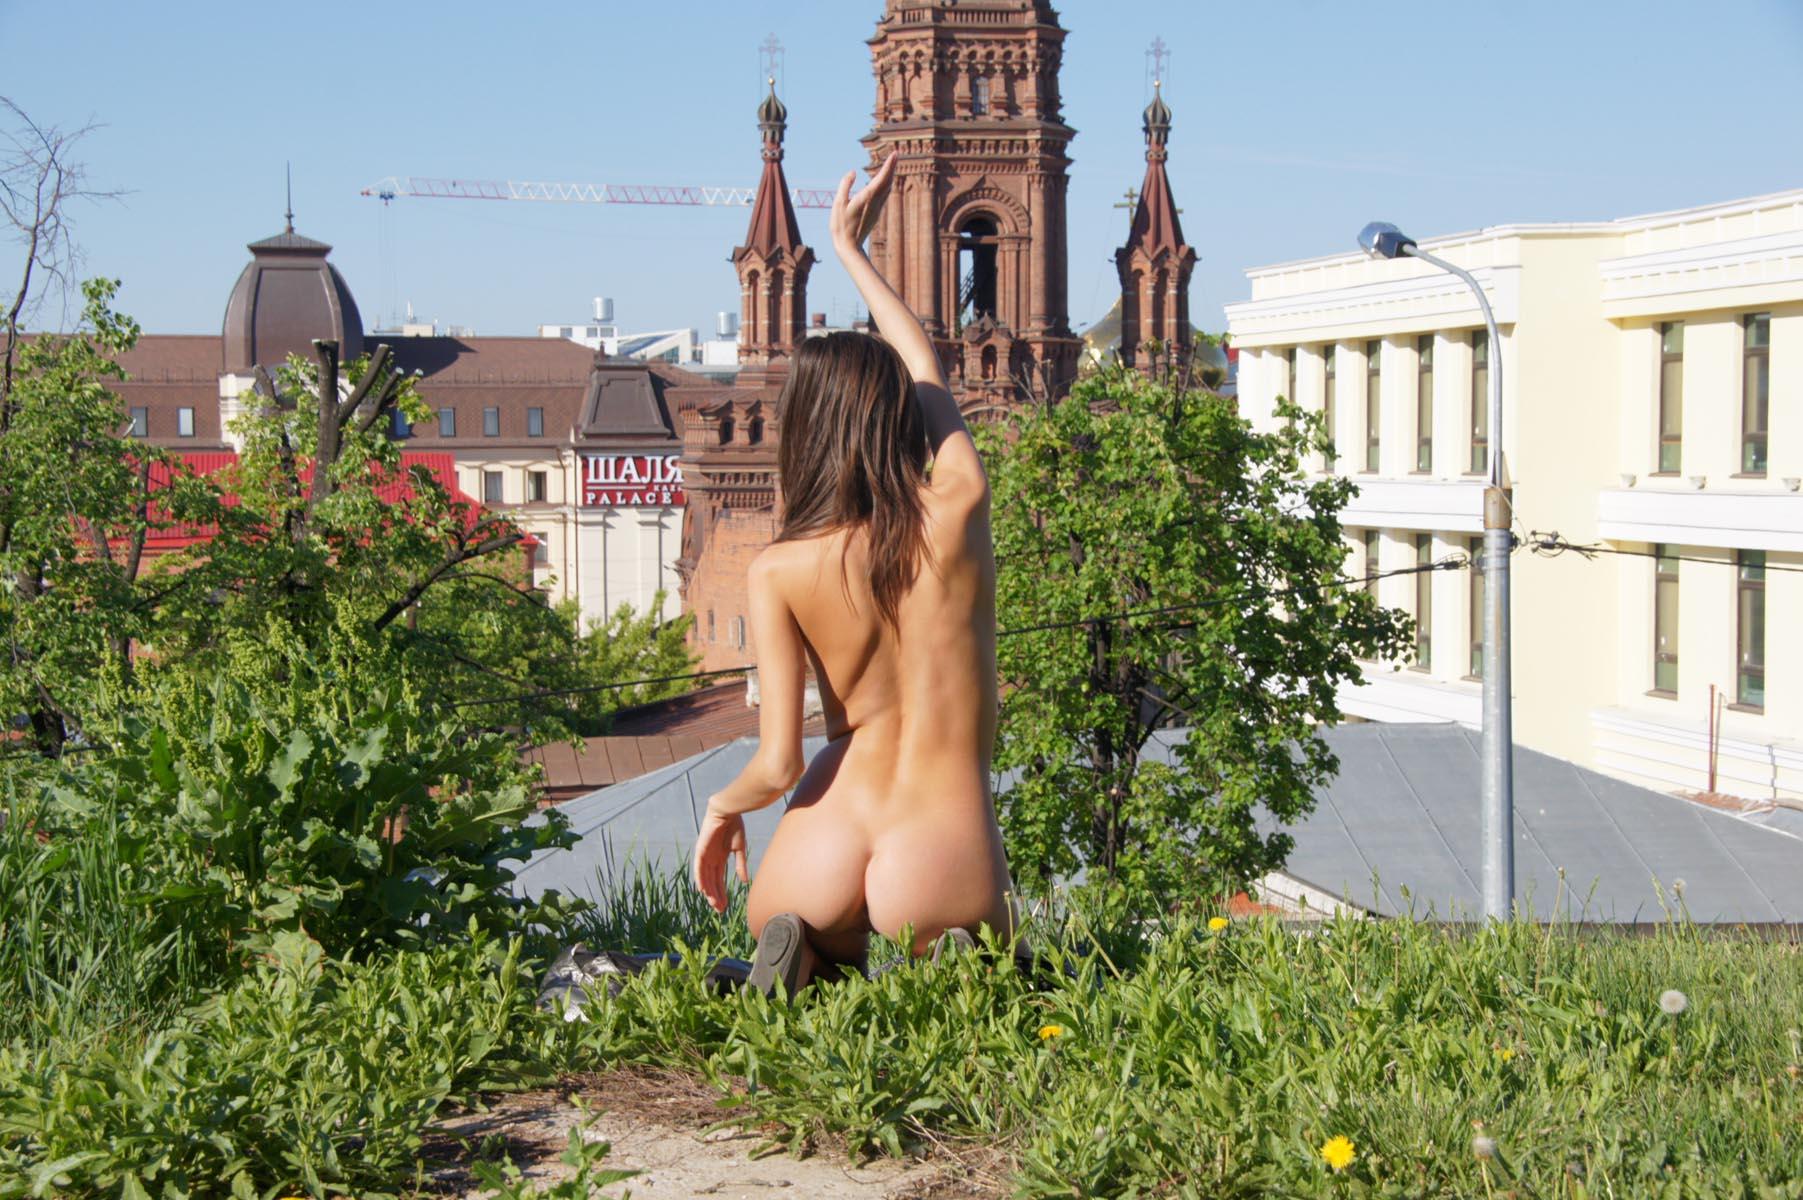 irina-k-naked-in-russia-kazan-nude-public-03